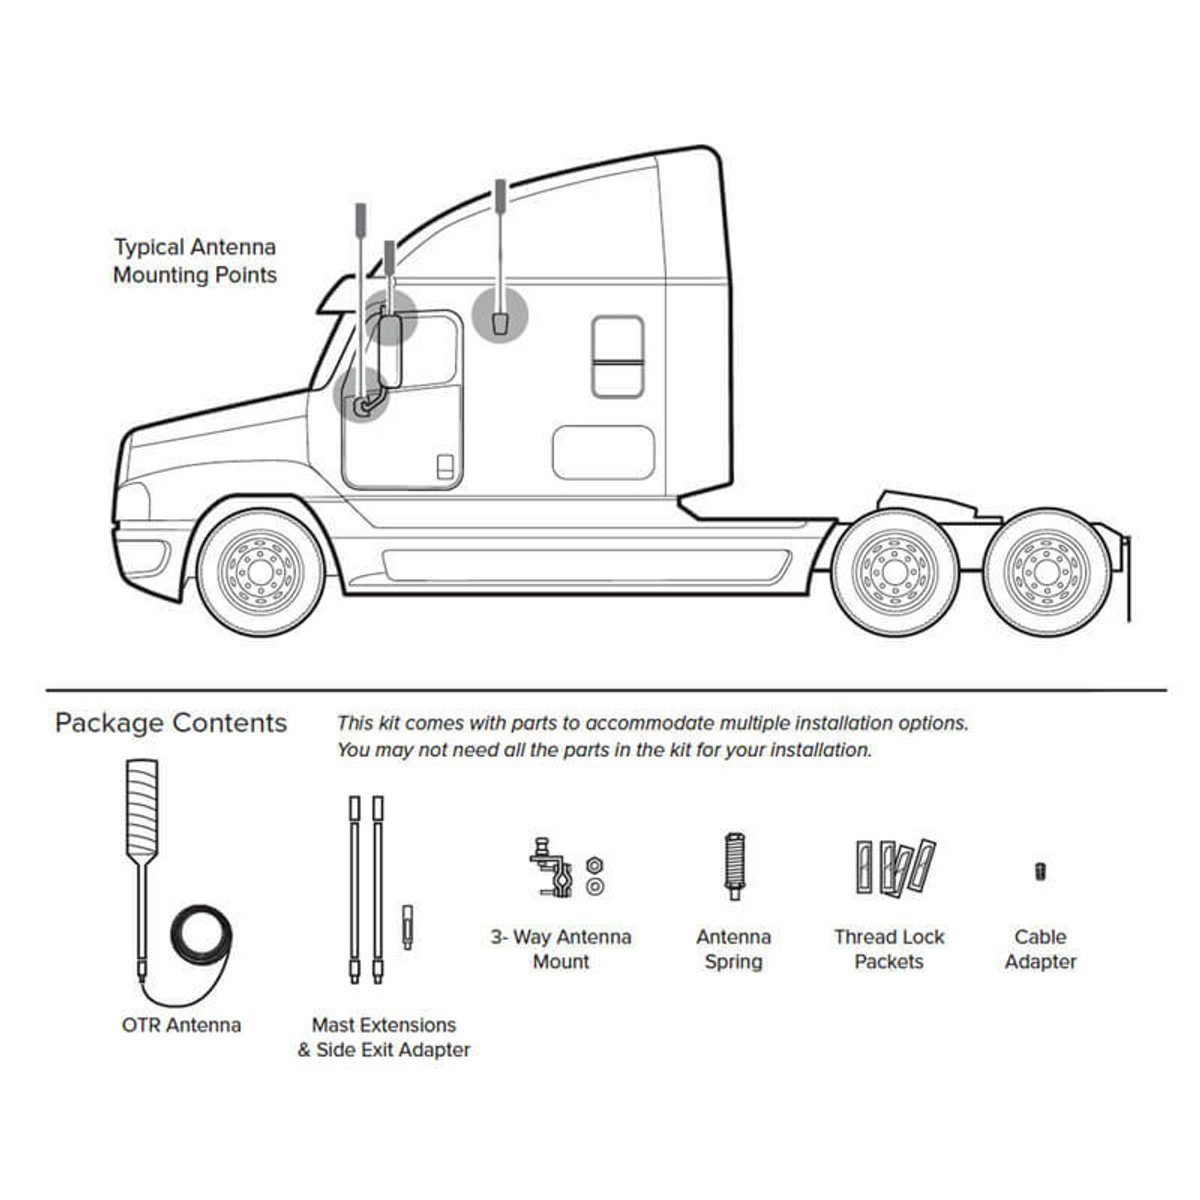 Wilson Electronics Wilson 304415 4G-OTR Antenna Truck Edition